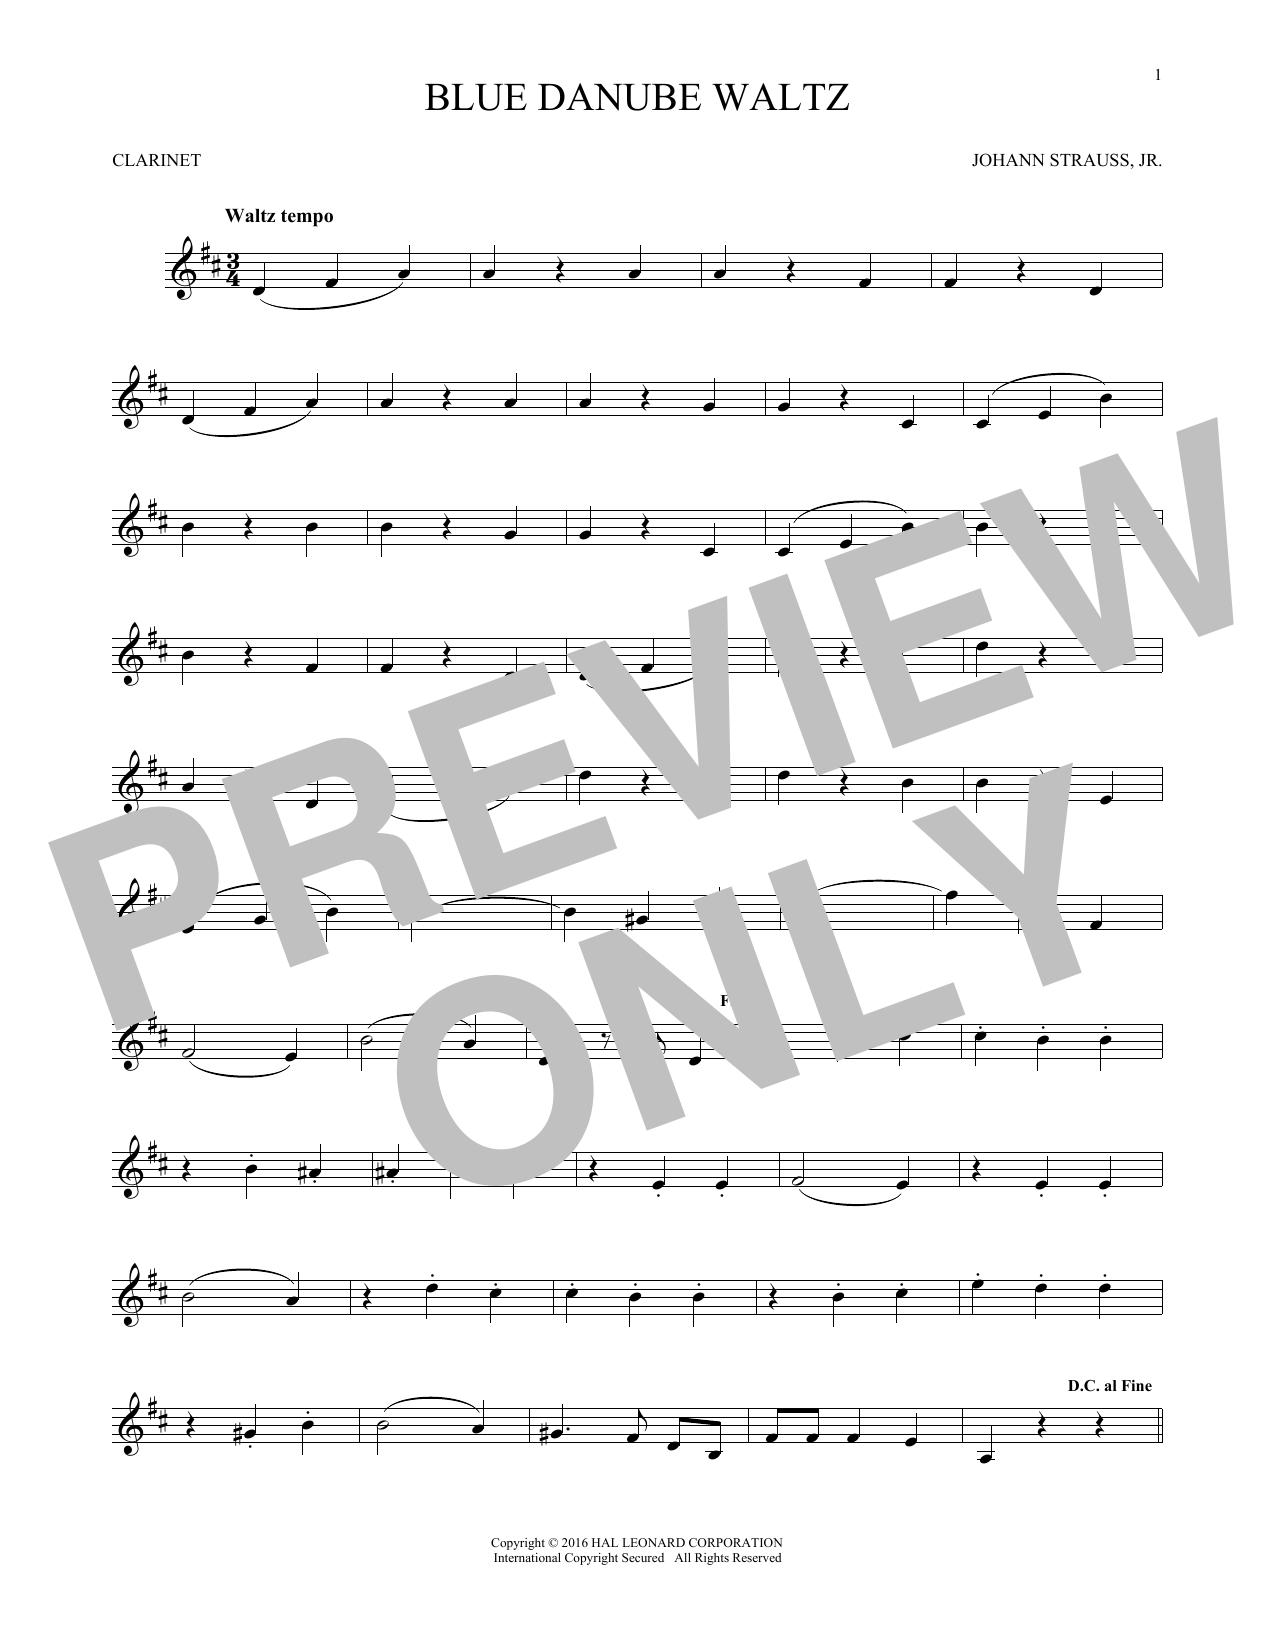 Blue Danube Waltz (Clarinet Solo)